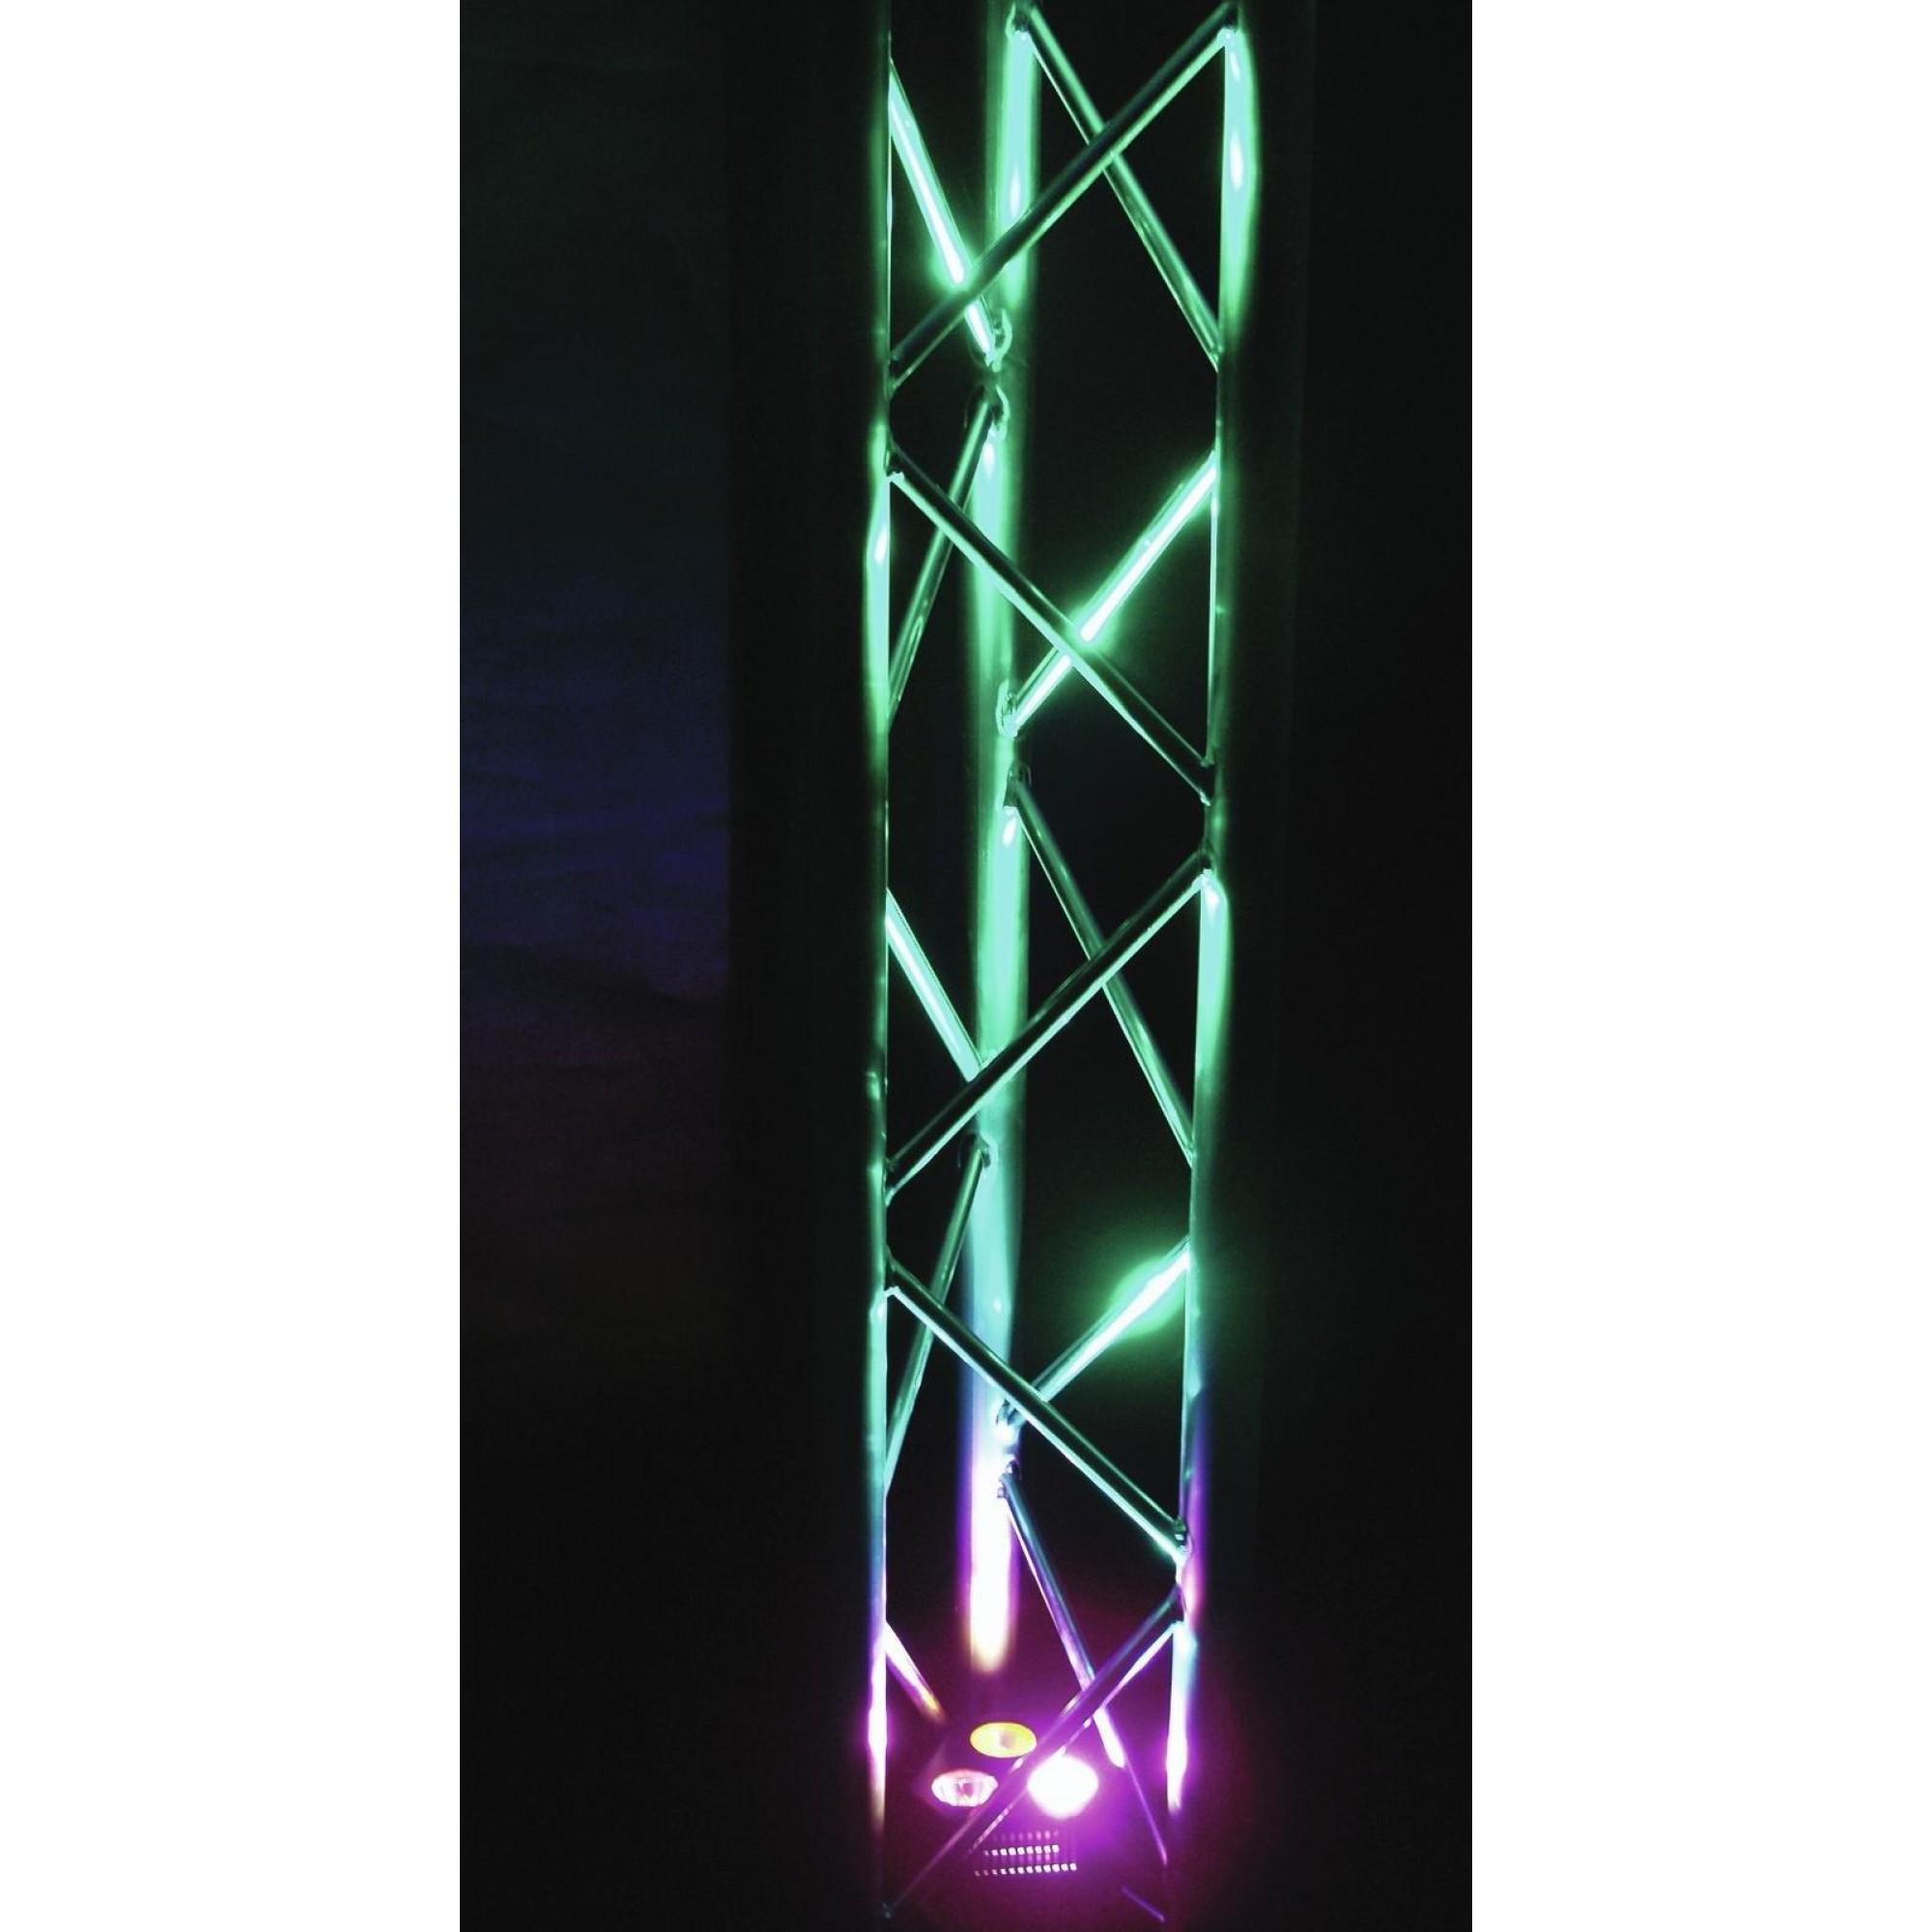 EUROLITE RGB TL-150 DMX